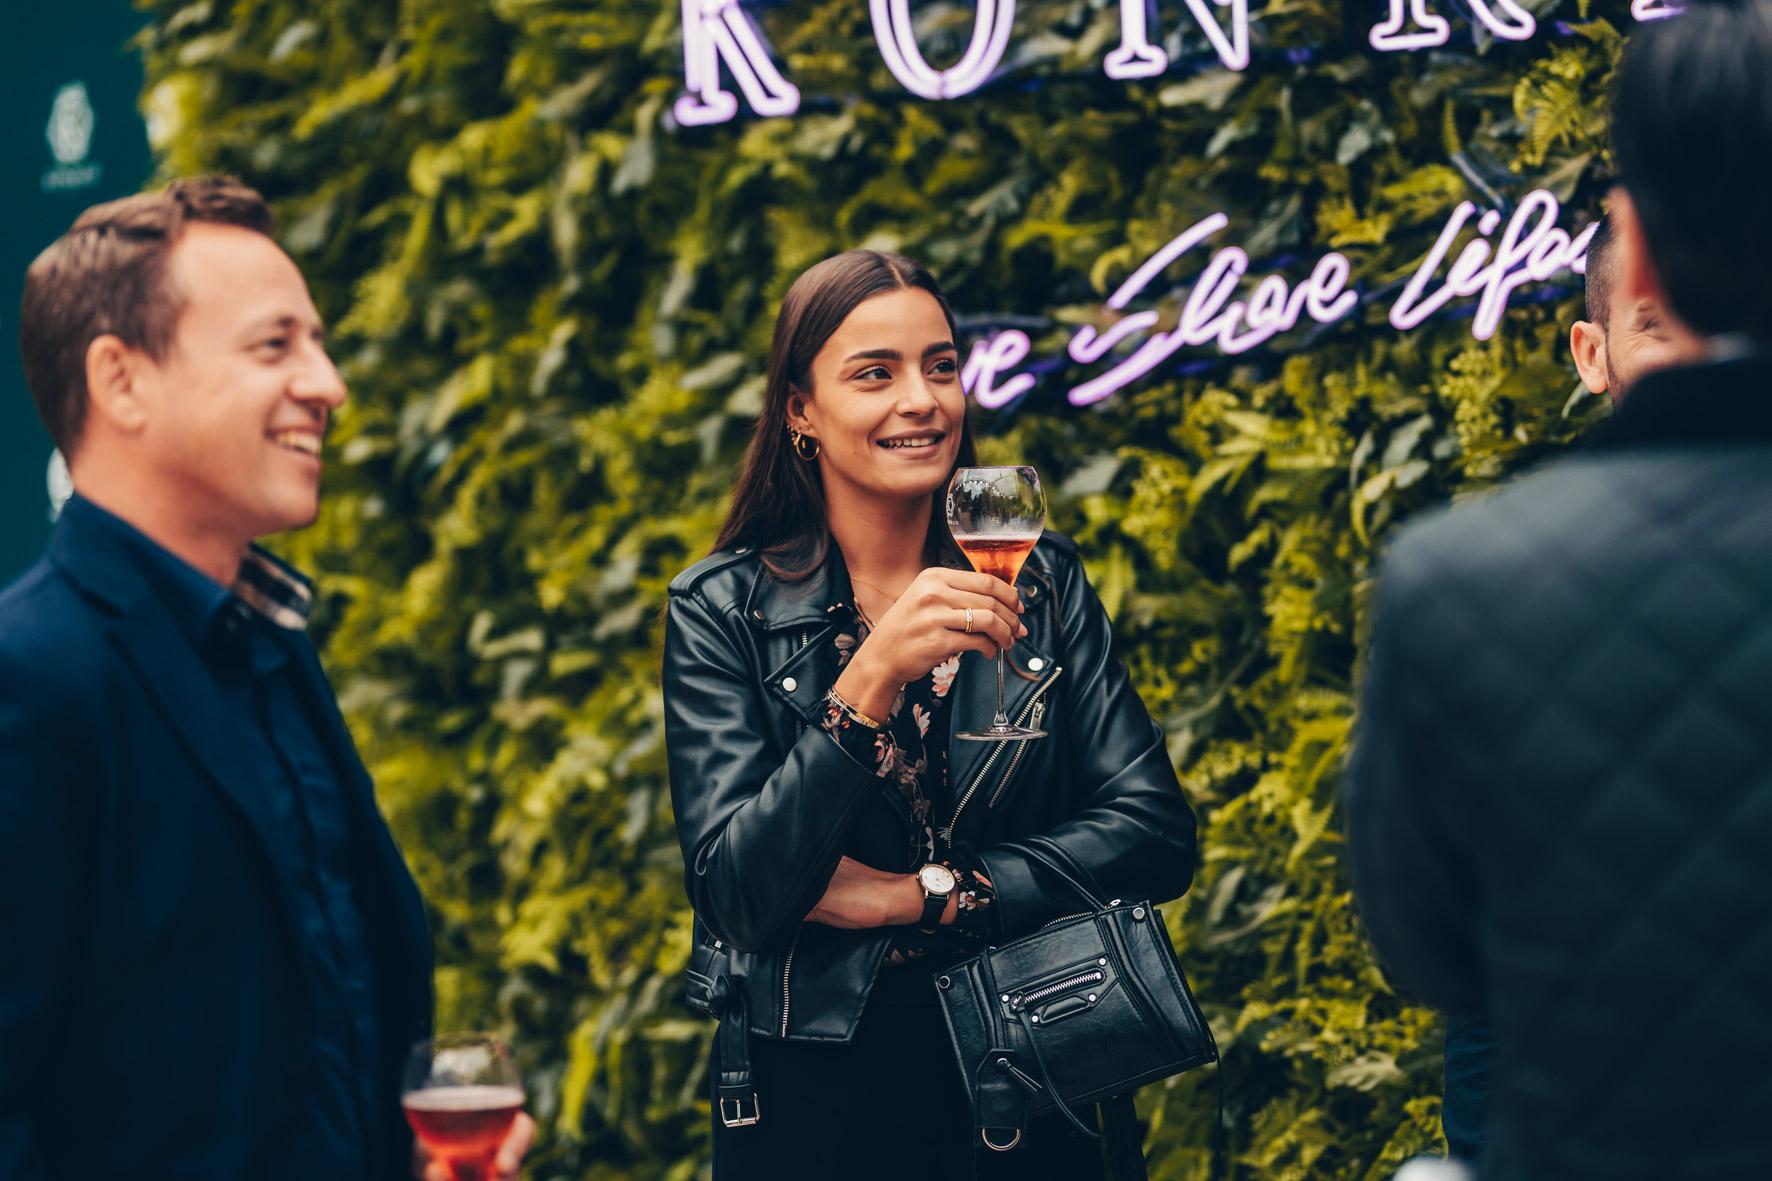 Konrad-lifestyle-art-basel-%22prestige%22-2019-63.jpg